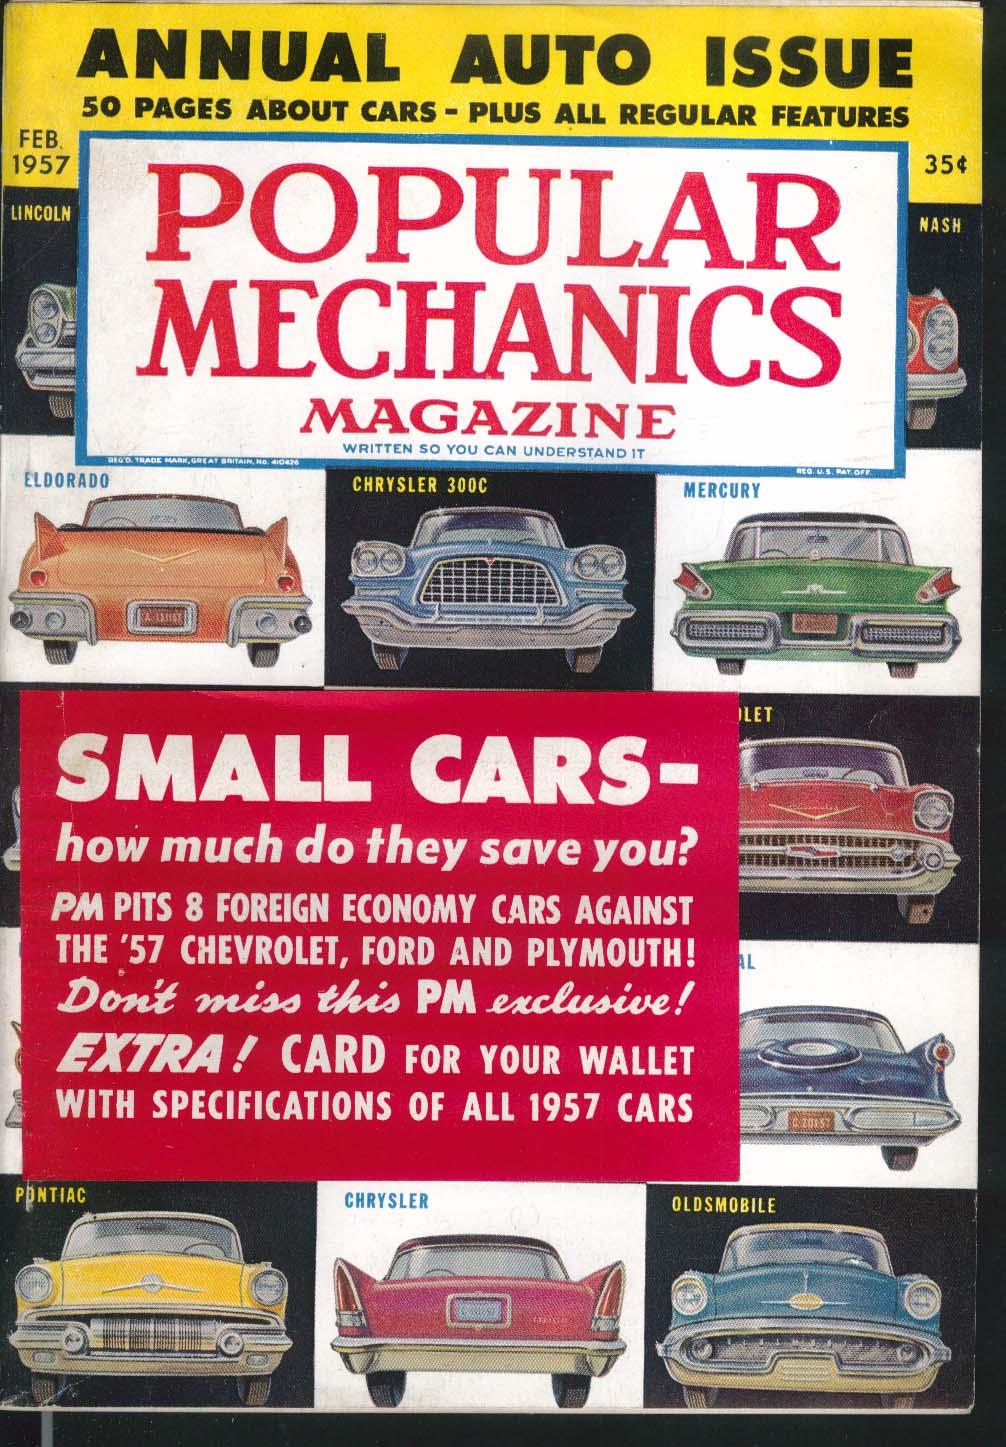 POPULAR MECHANICS Lincoln Nash Eldorado Chrysler 300C Mercury Oldsmobile 2 1957